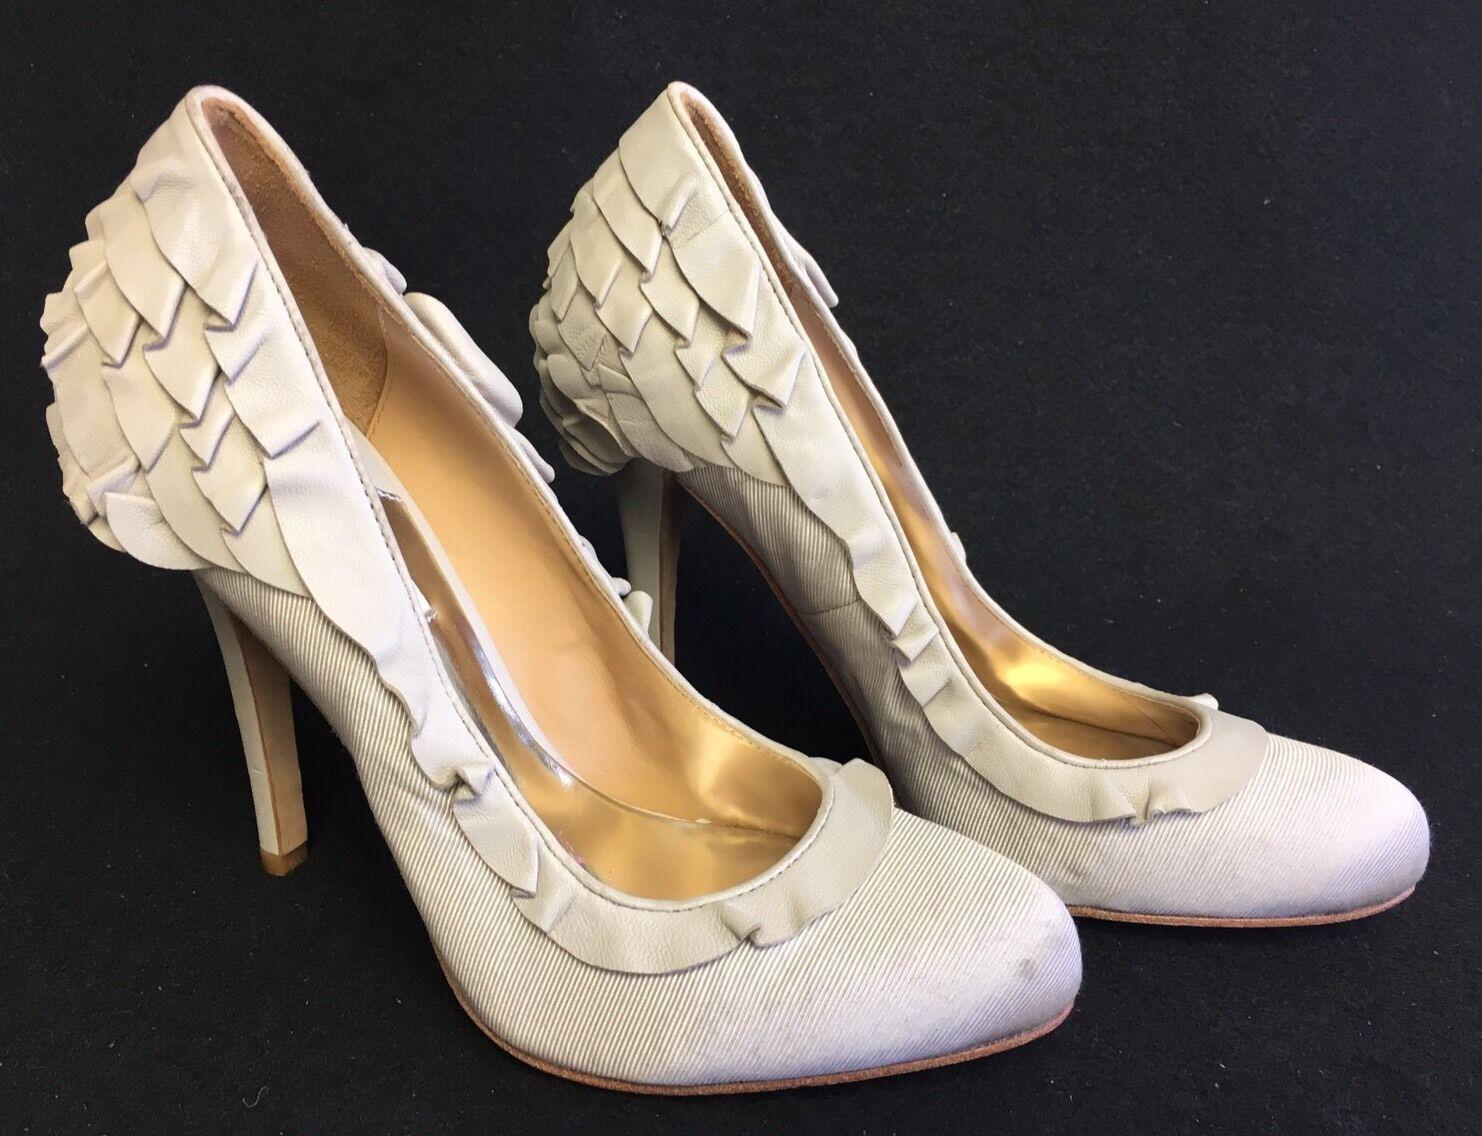 Badgley Mischka Ruffle Heels Pumps Classics Leather Grograin Heels Round Toe